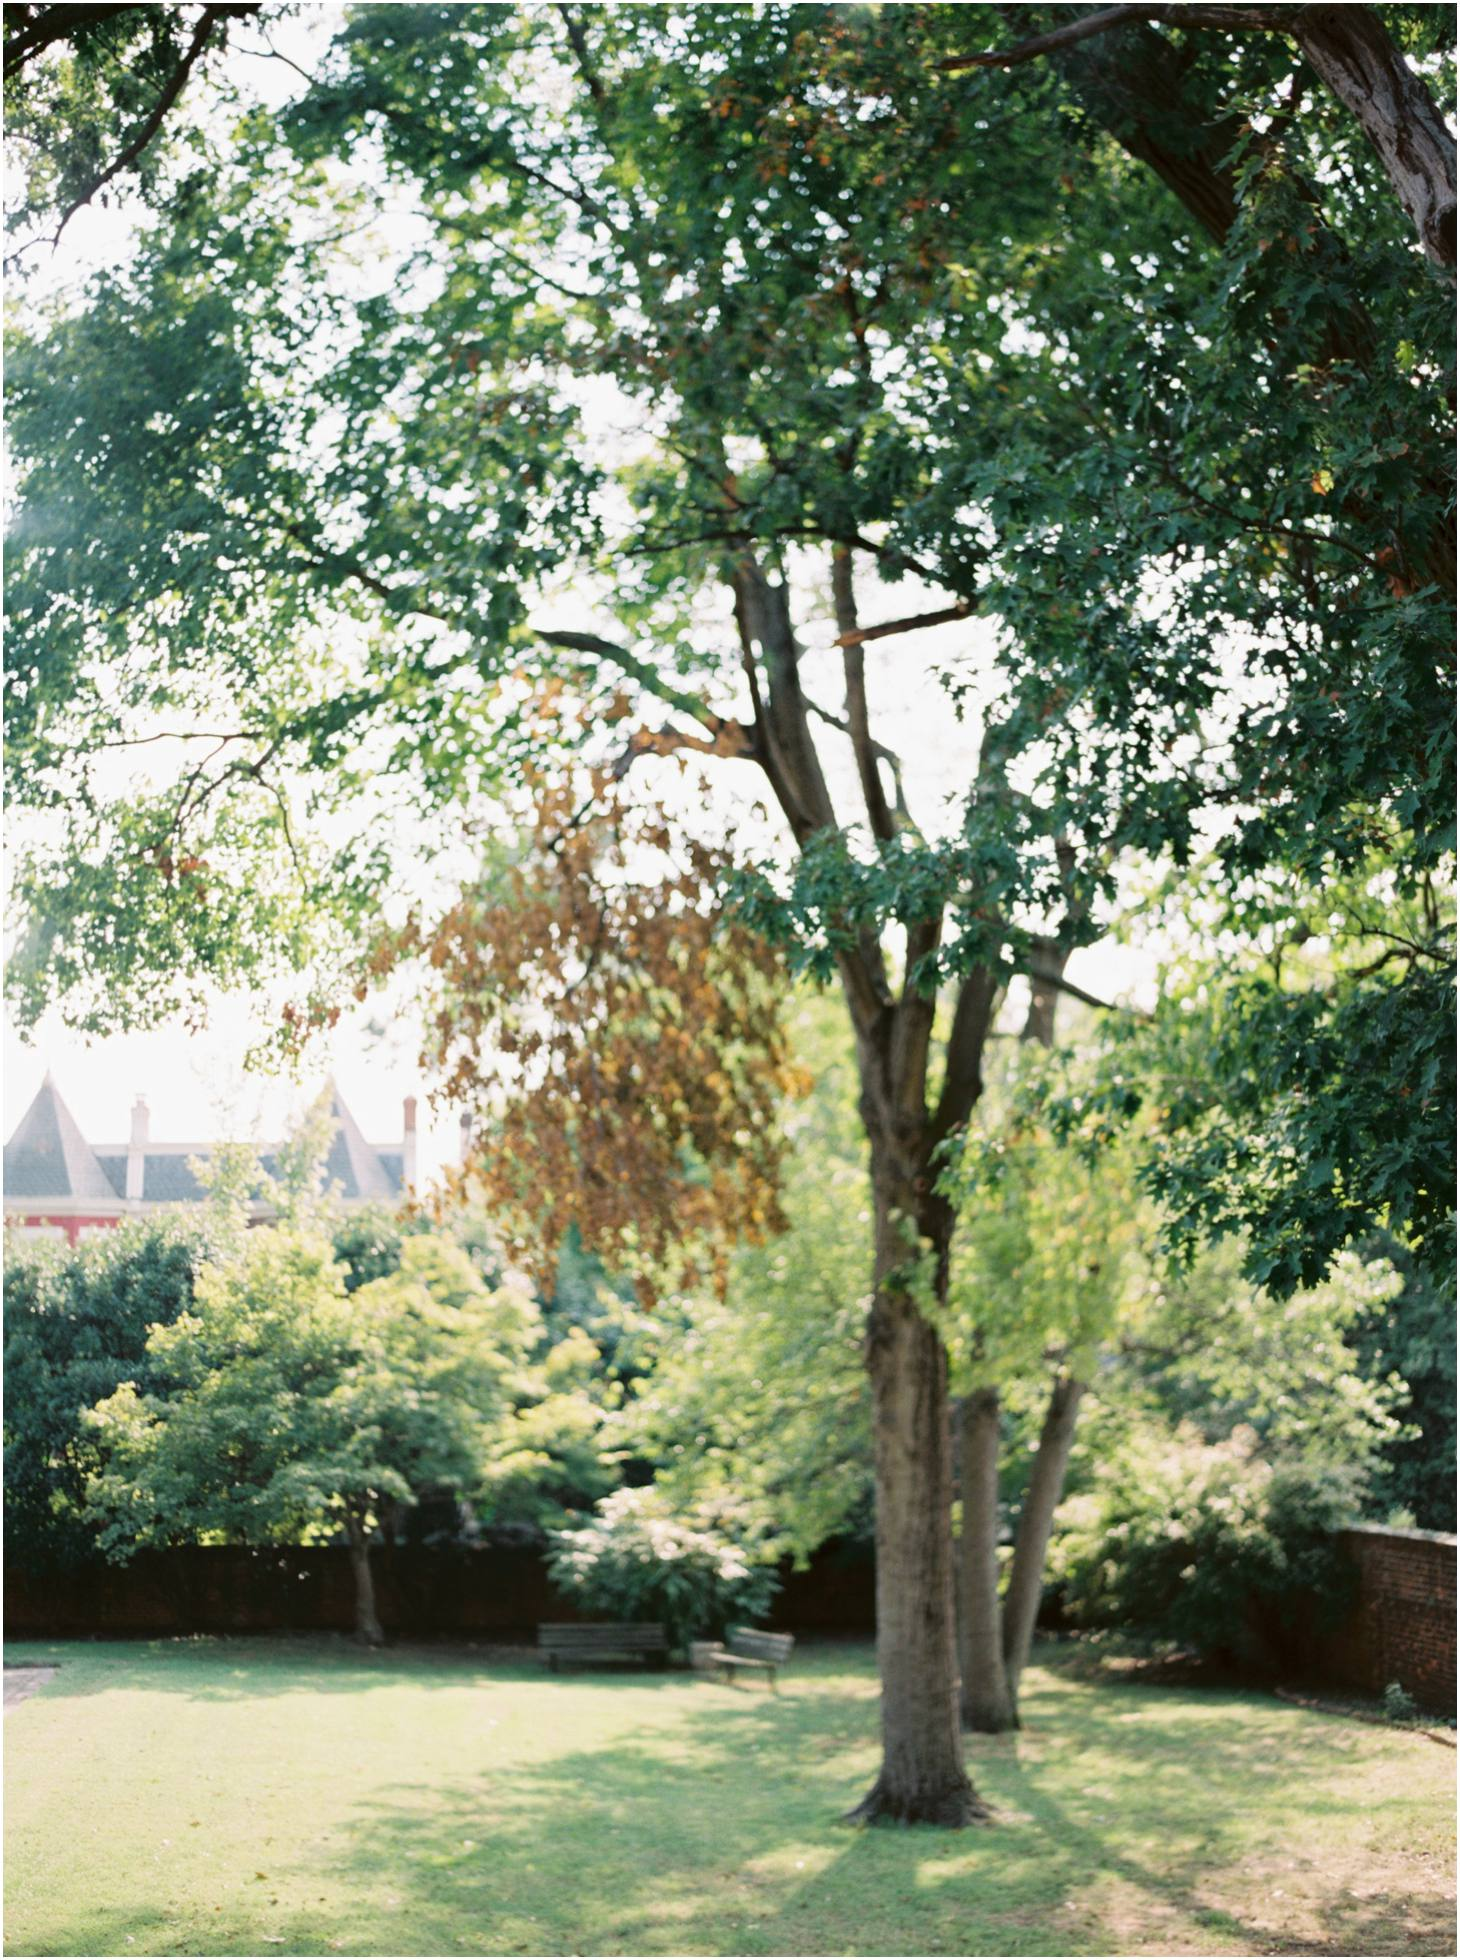 kim-stockwell-photography-fine-art-film-richmond-va-the-branch-museum_0003